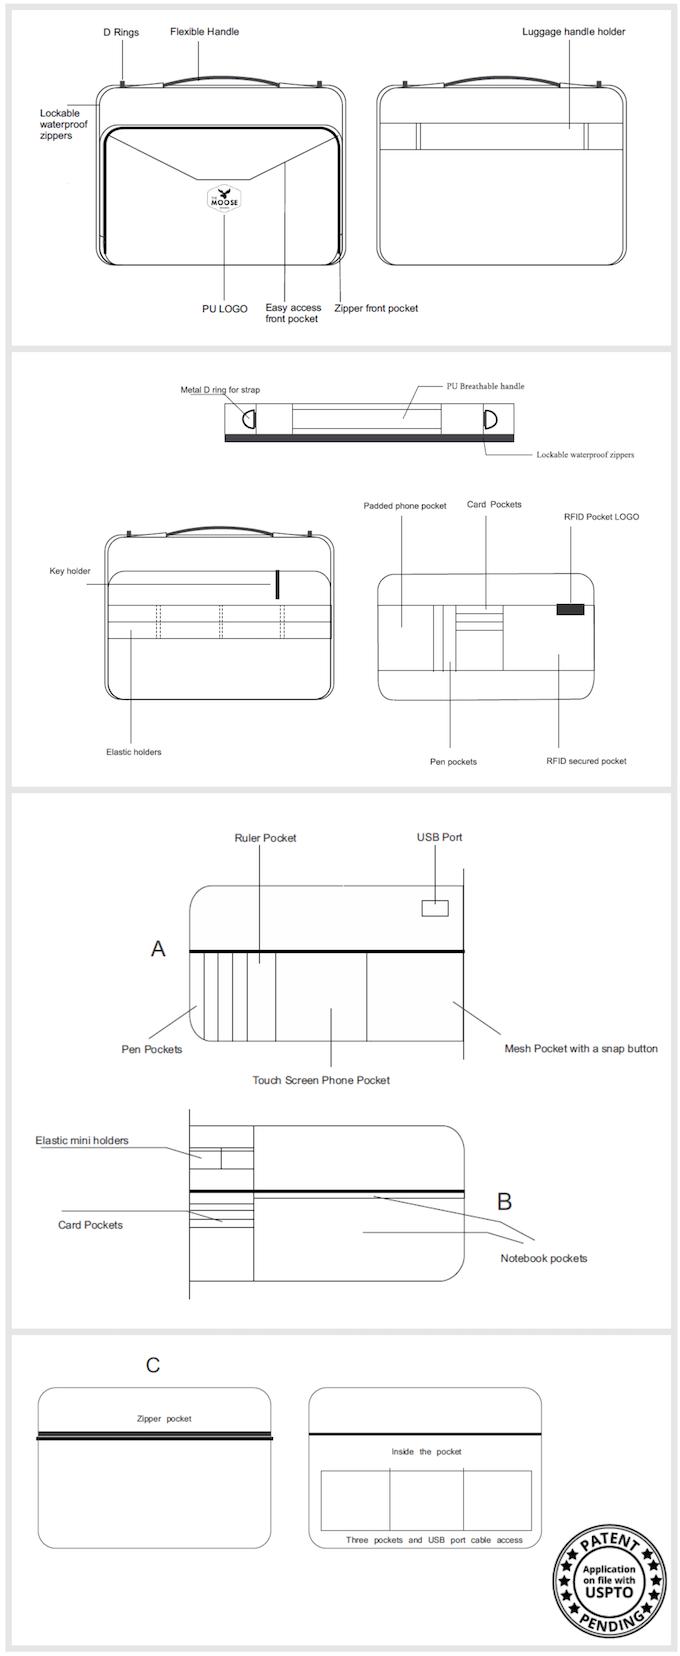 Detailed designs and descriptions